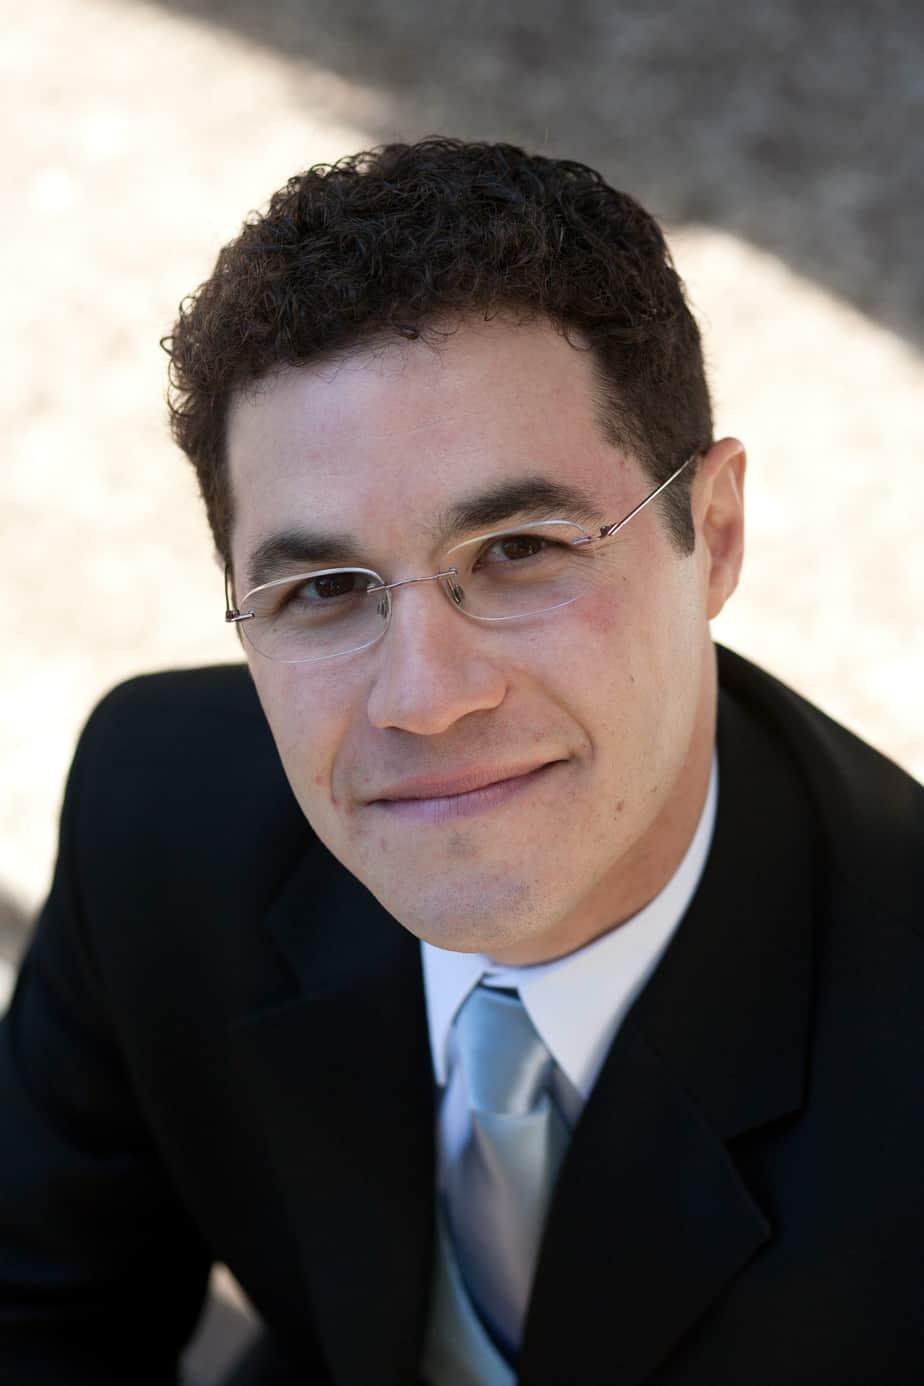 Boulder JCC Executive Director Jonathan Lev